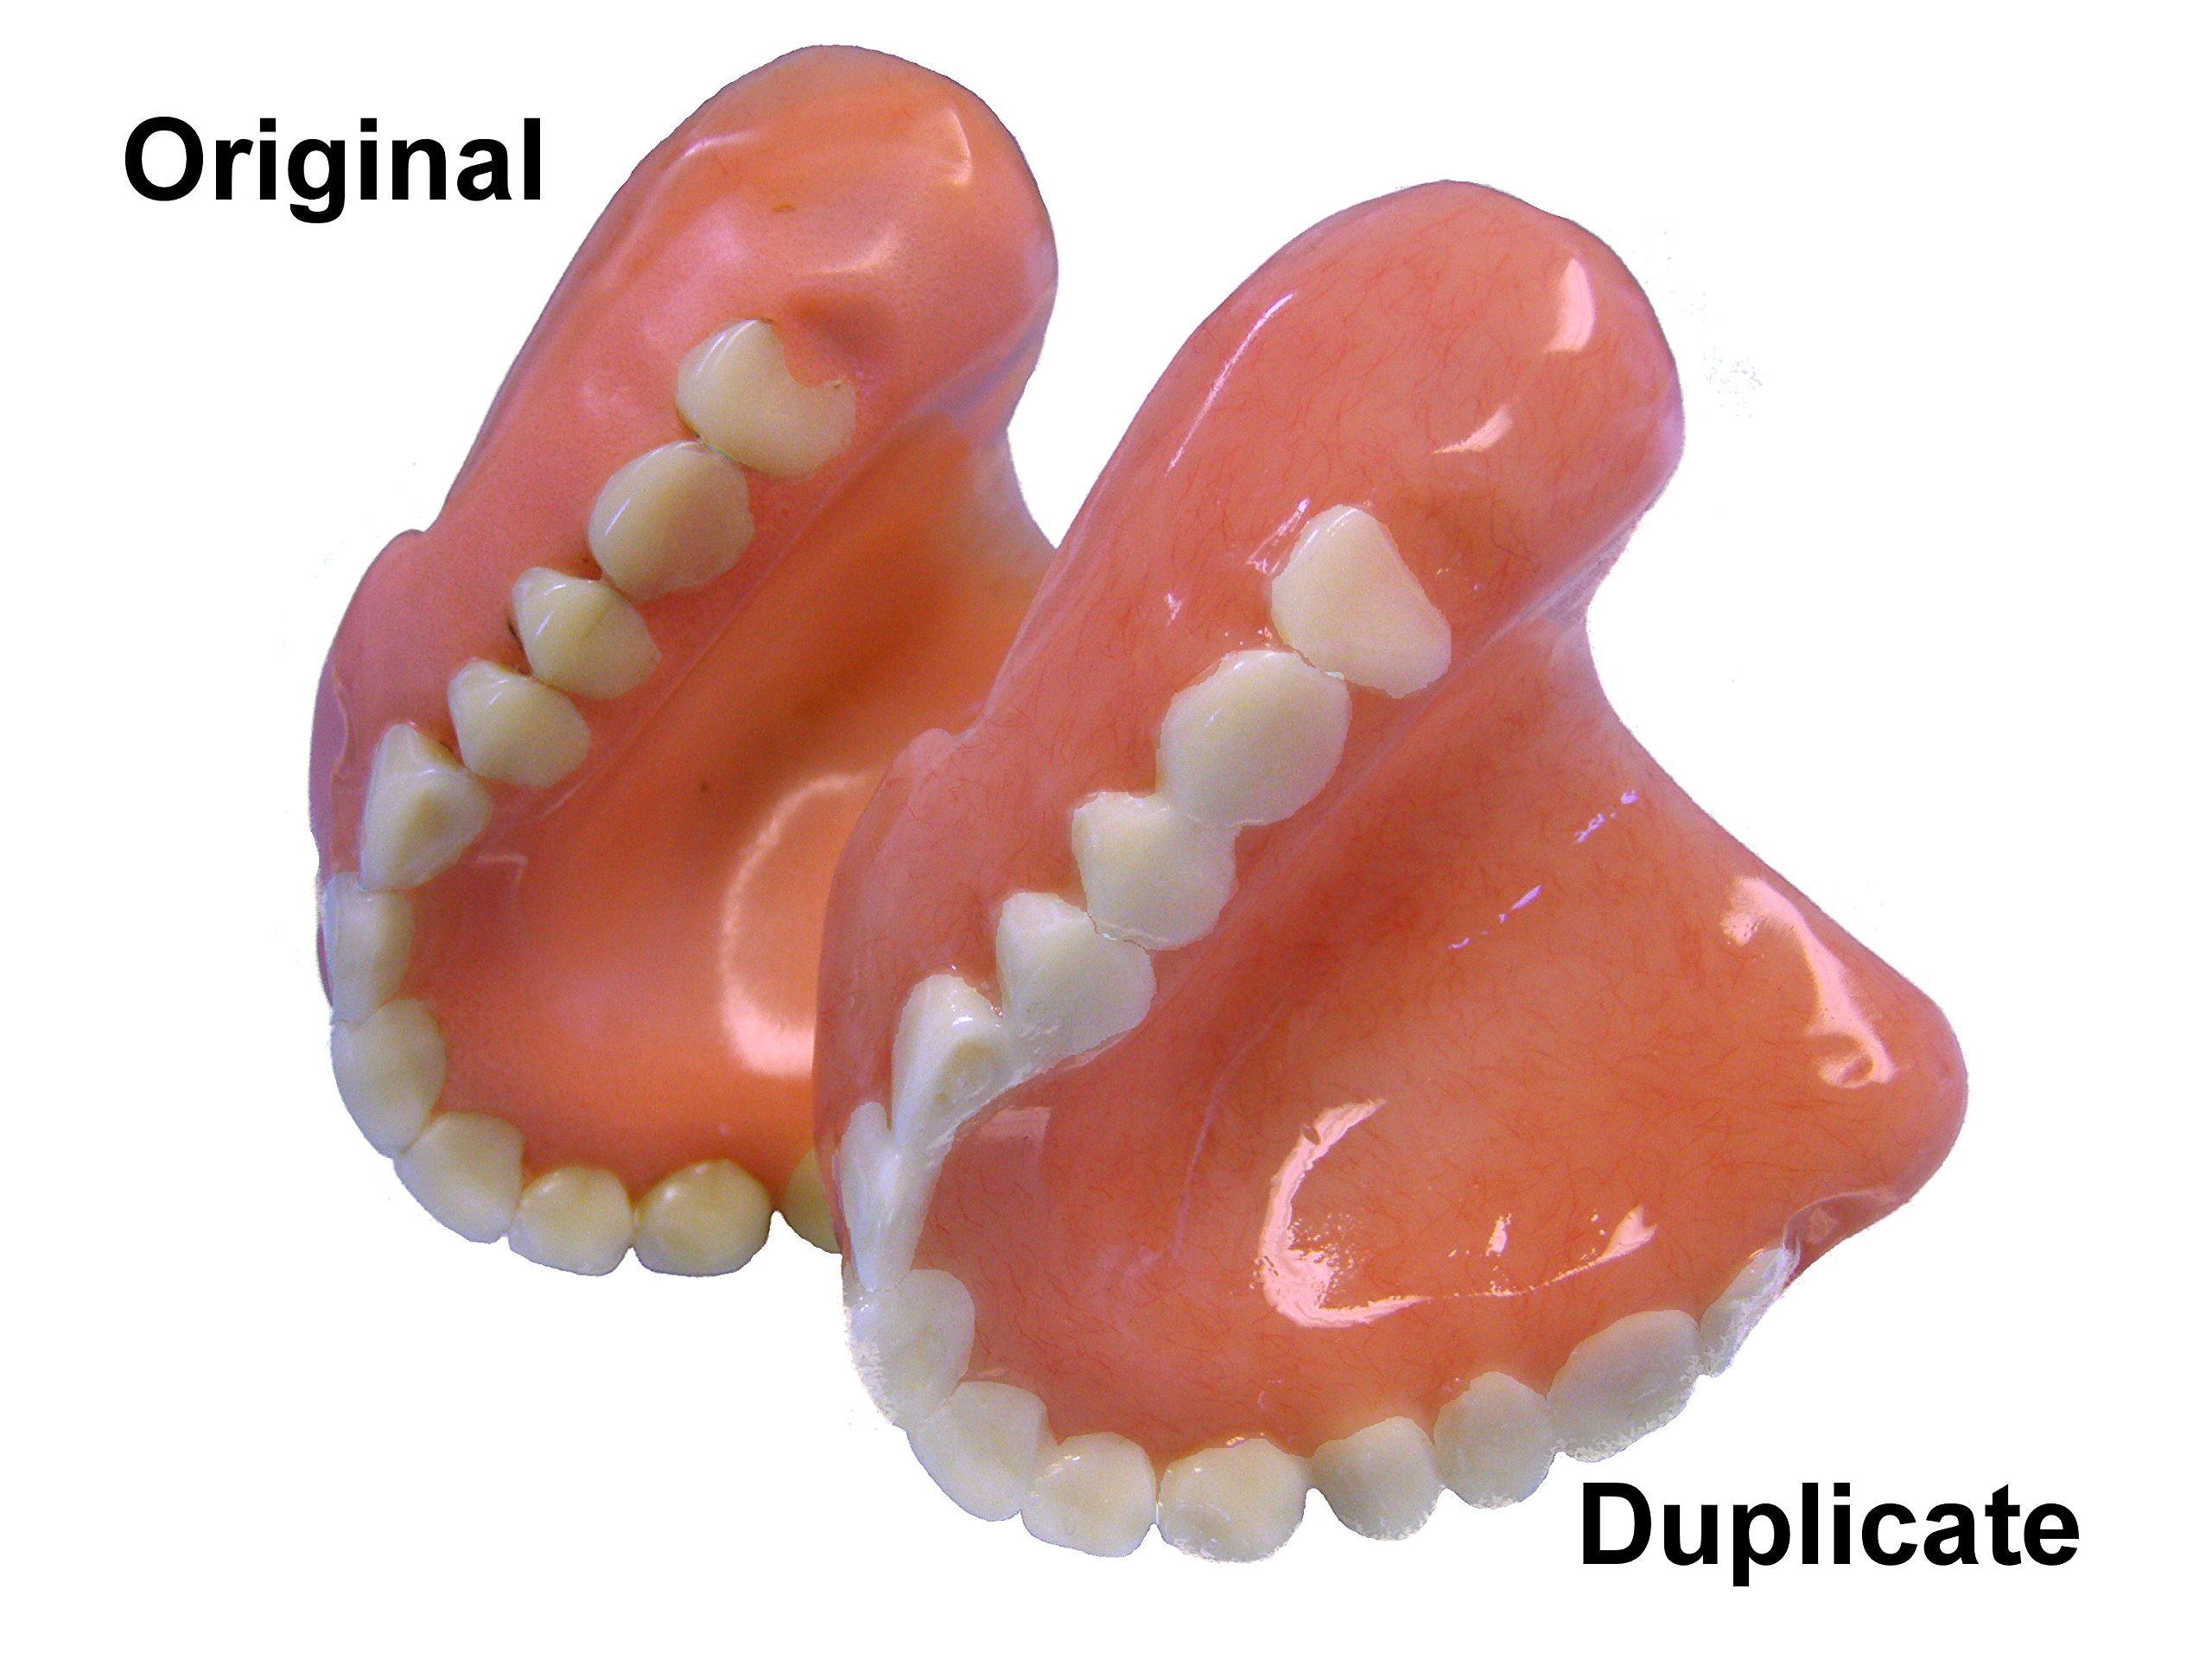 Denture Repair Lab - Duplicate Denture - Denture Repair - Denture Duplication - New Denture - Copy Denture - Spare Denture - Denture Clone - Denture Teeth Repair by Denture Repair Lab